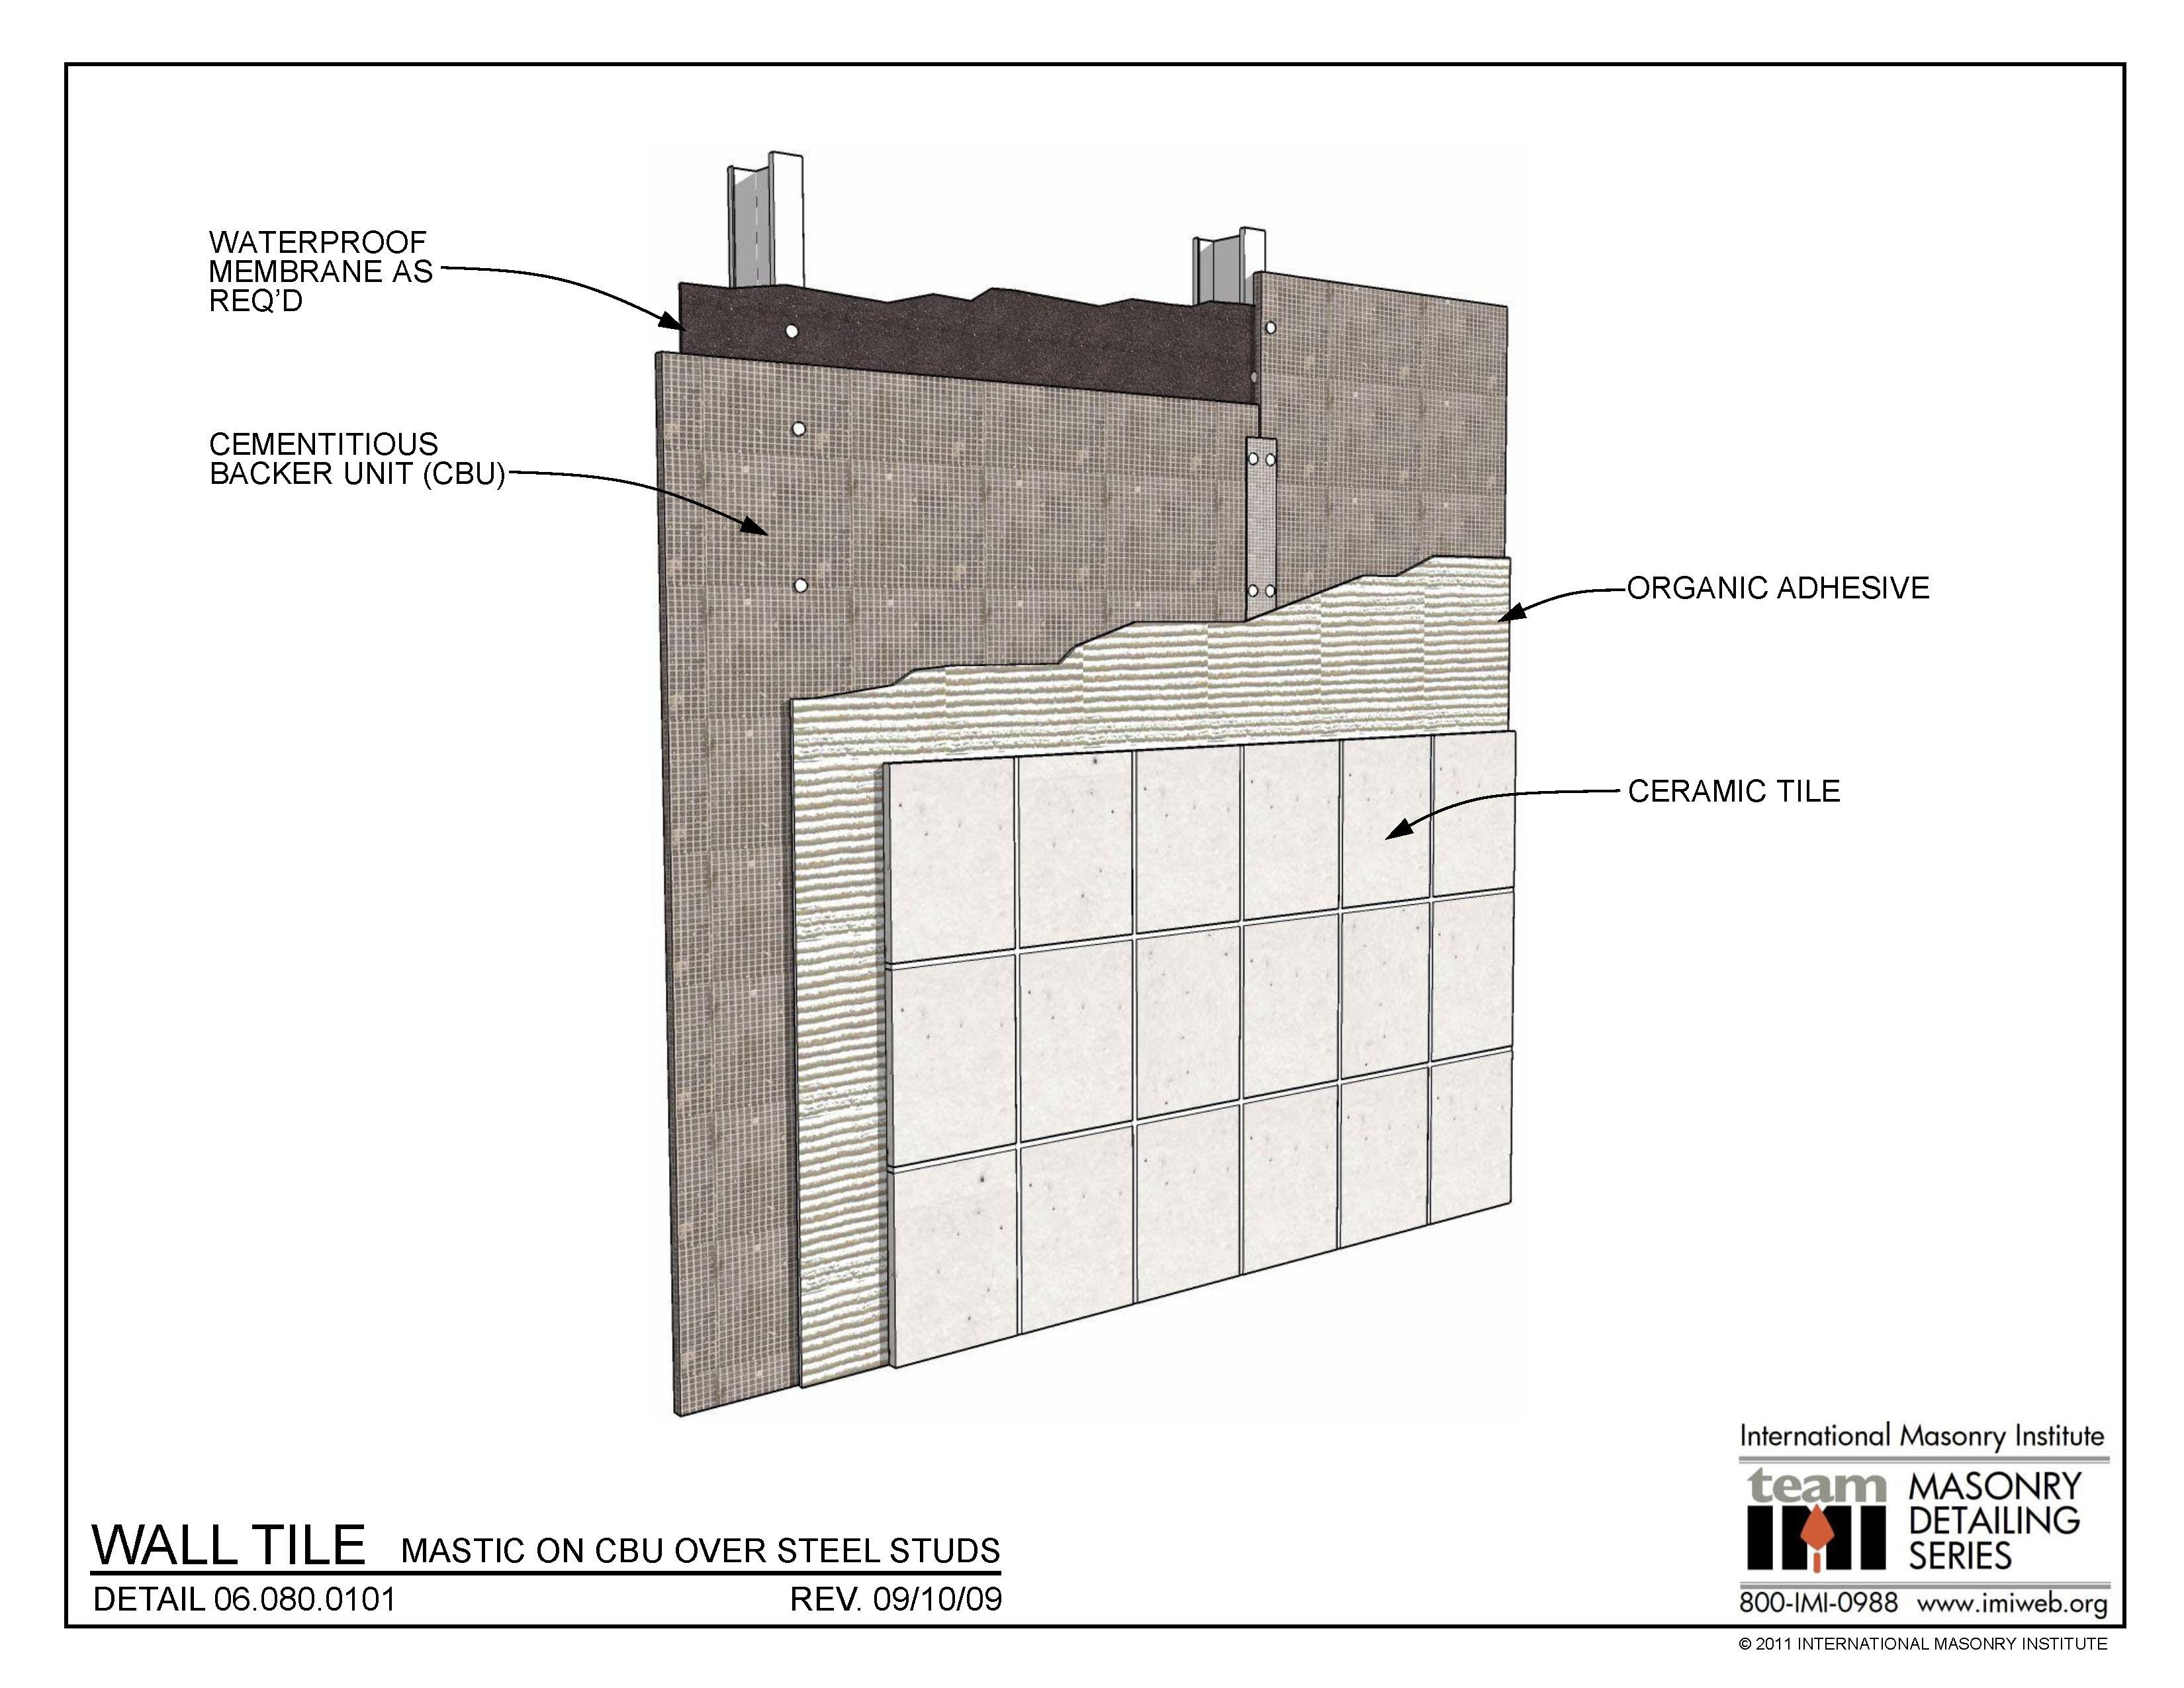 06 080 0101 Wall Tile Mastic On Cbu Over Steel Studs